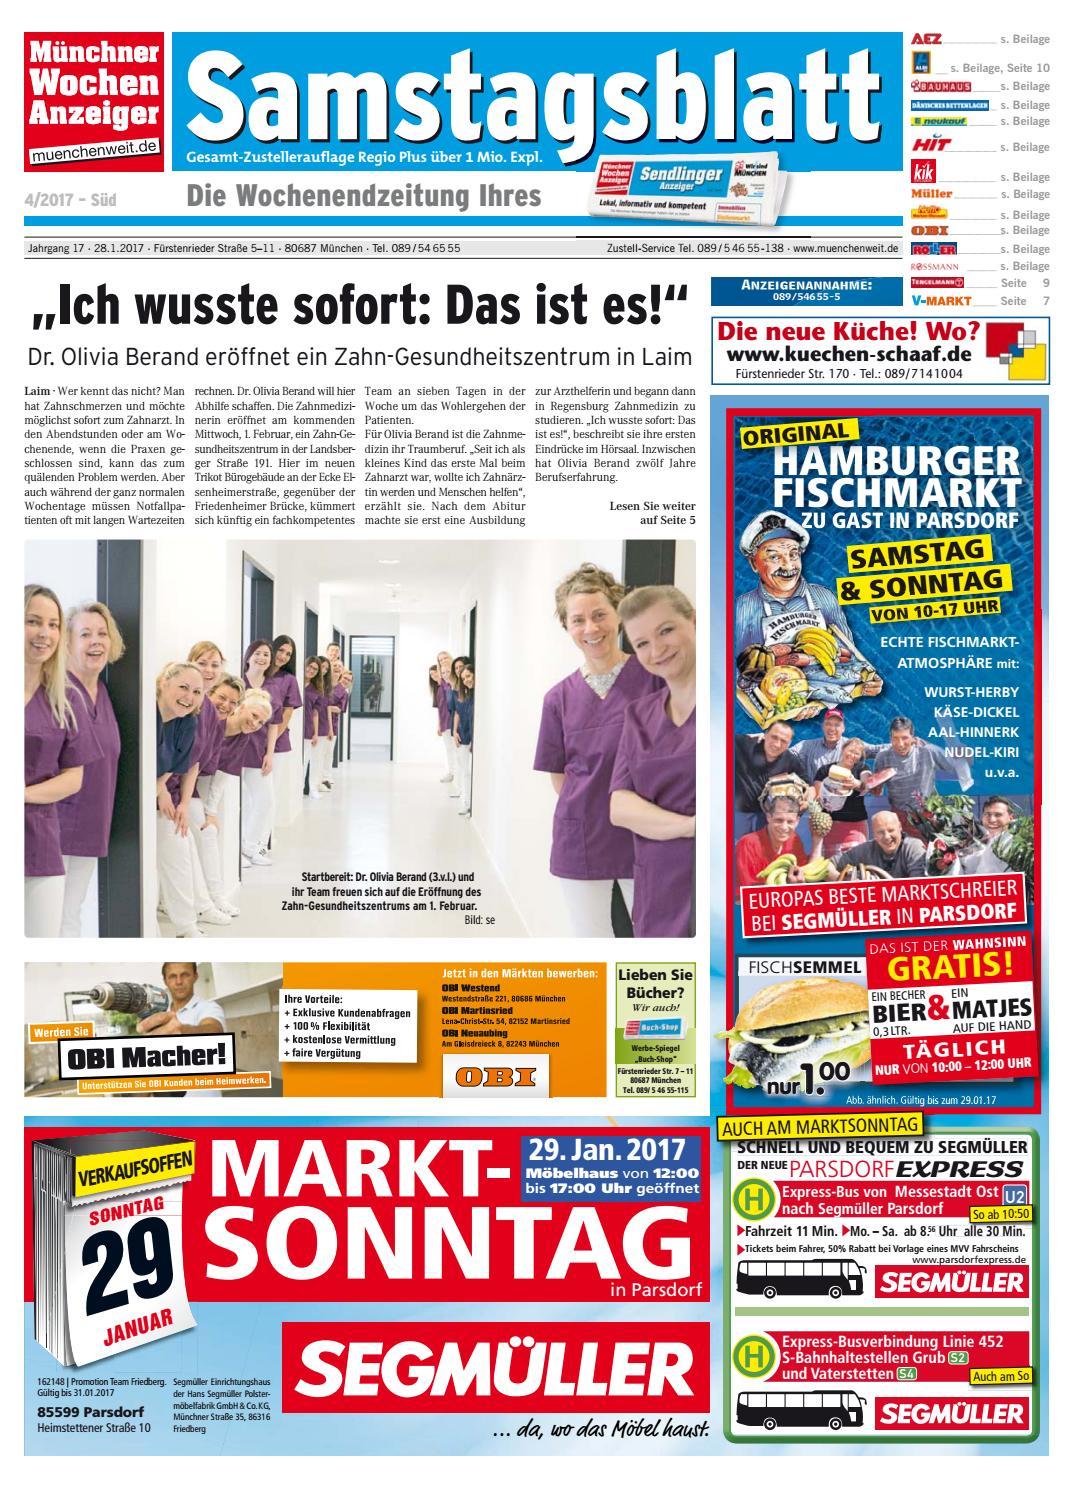 KW 04 2017 By Wochenanzeiger Me N GmbH Issuu